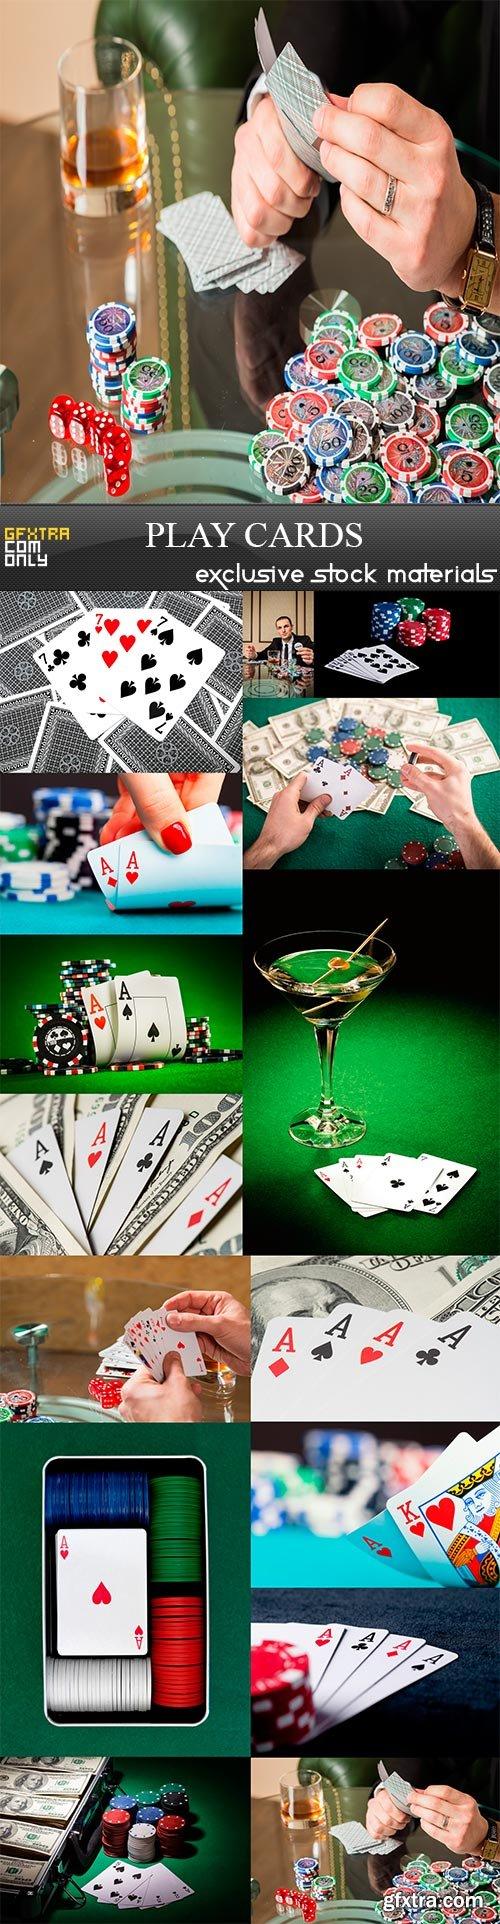 Play cards, 15 x UHQ JPEG